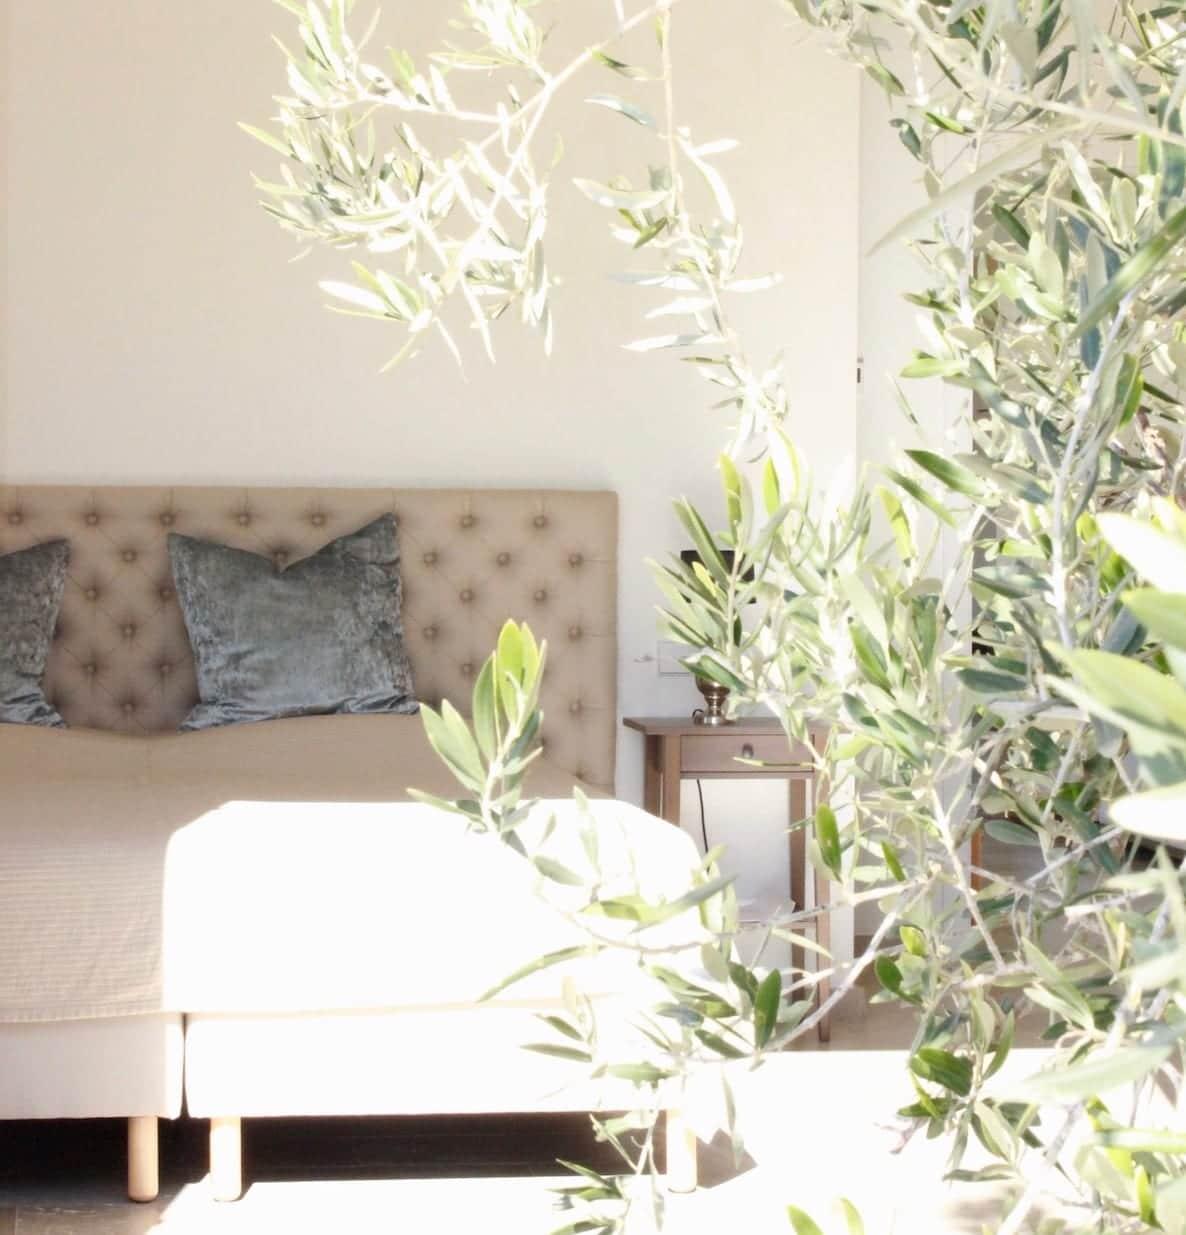 ISLA-Travel-Finca02-Campos-Schlafzimmer